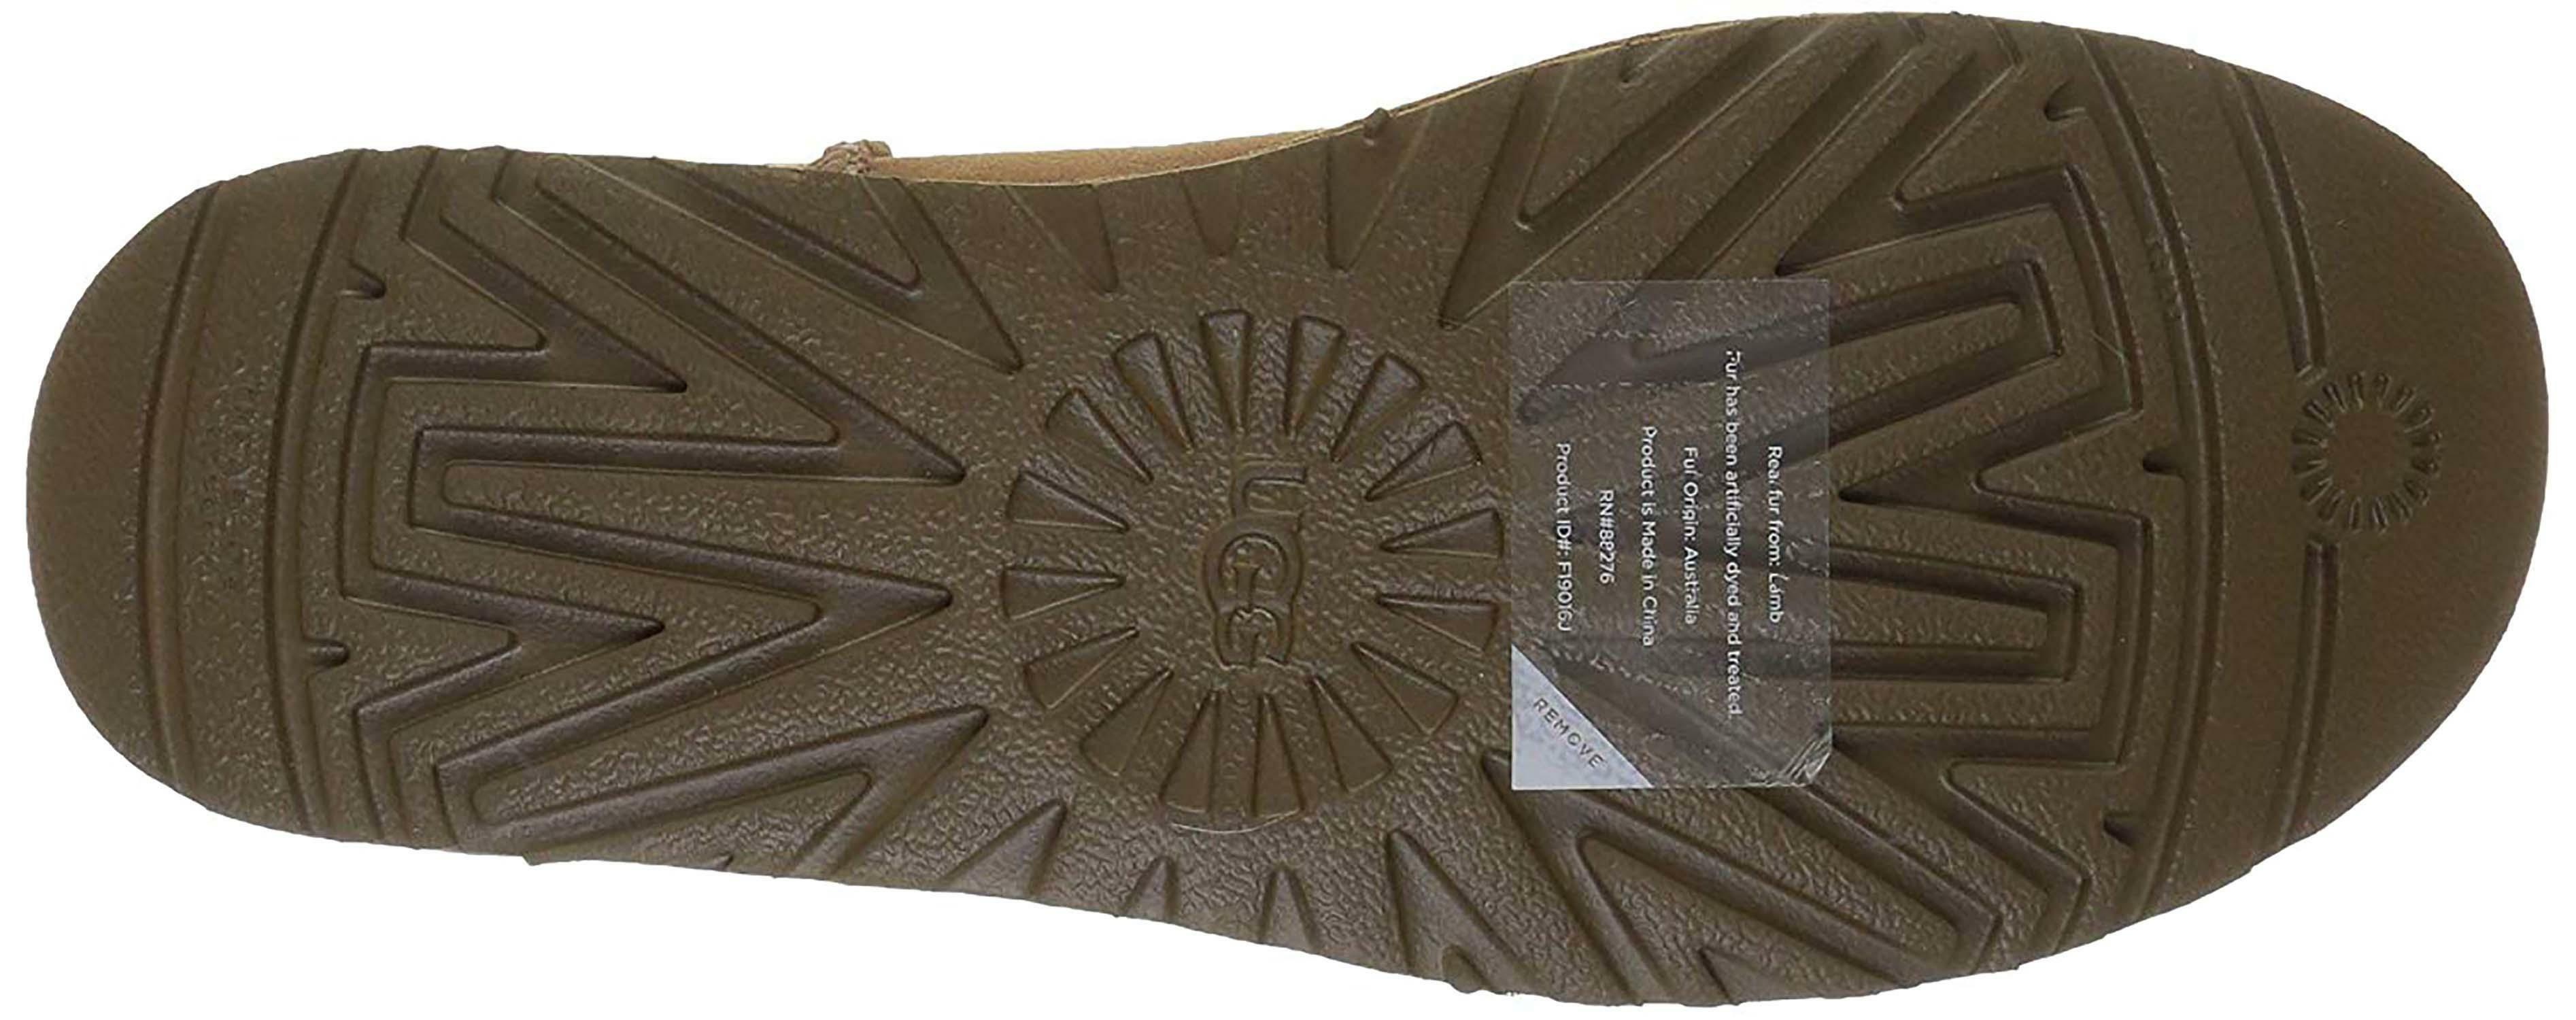 ugg ugg classic mini stivali donna marroni 1016222